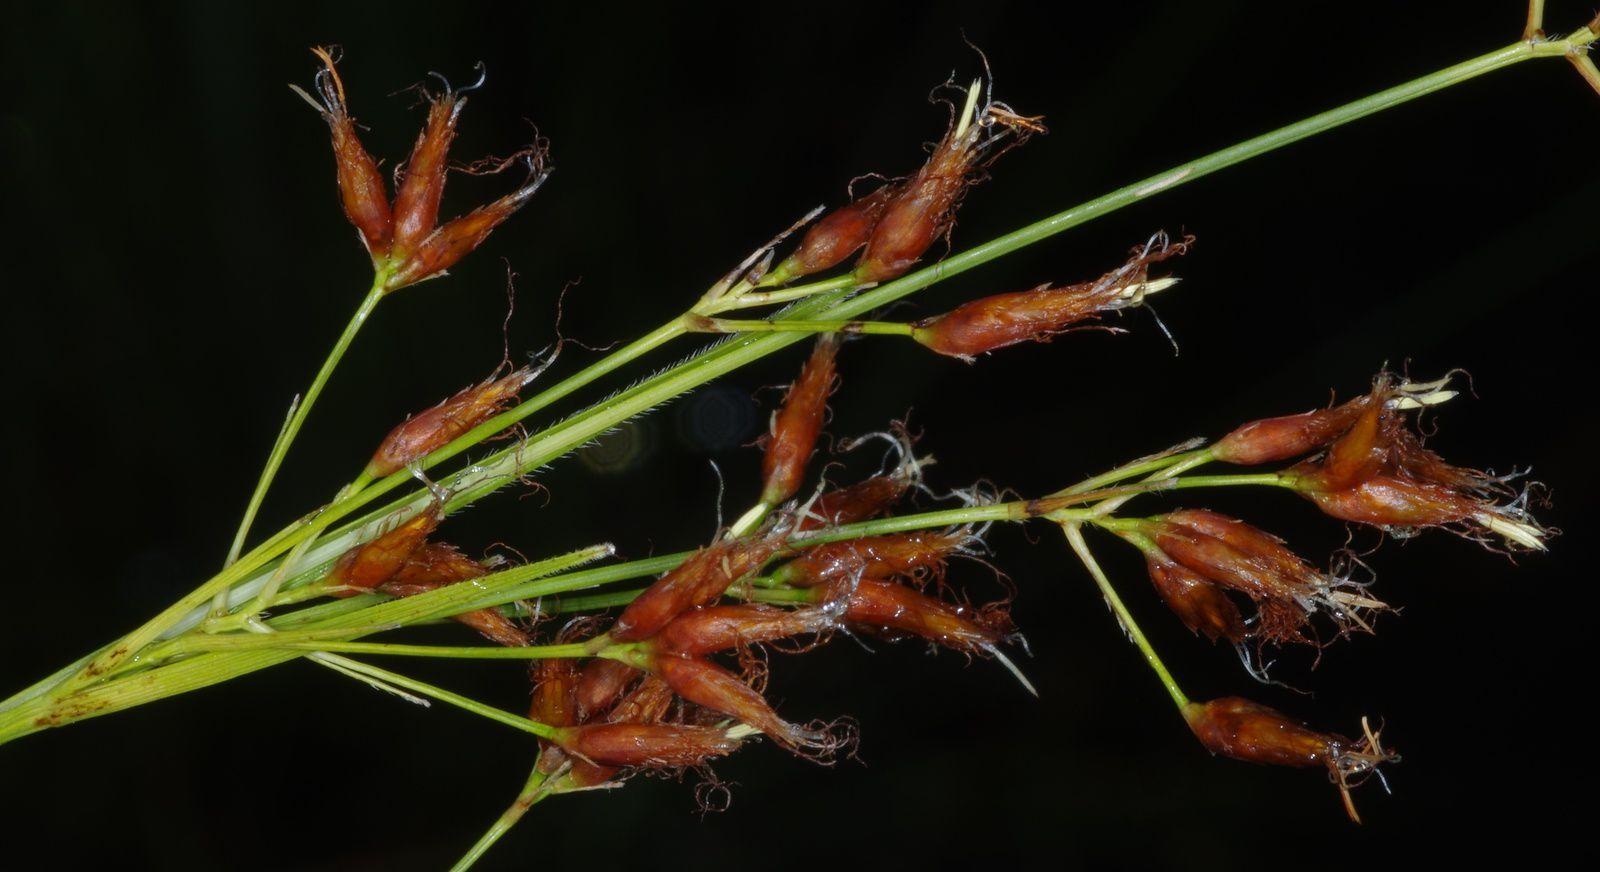 Rhynchospora velutina